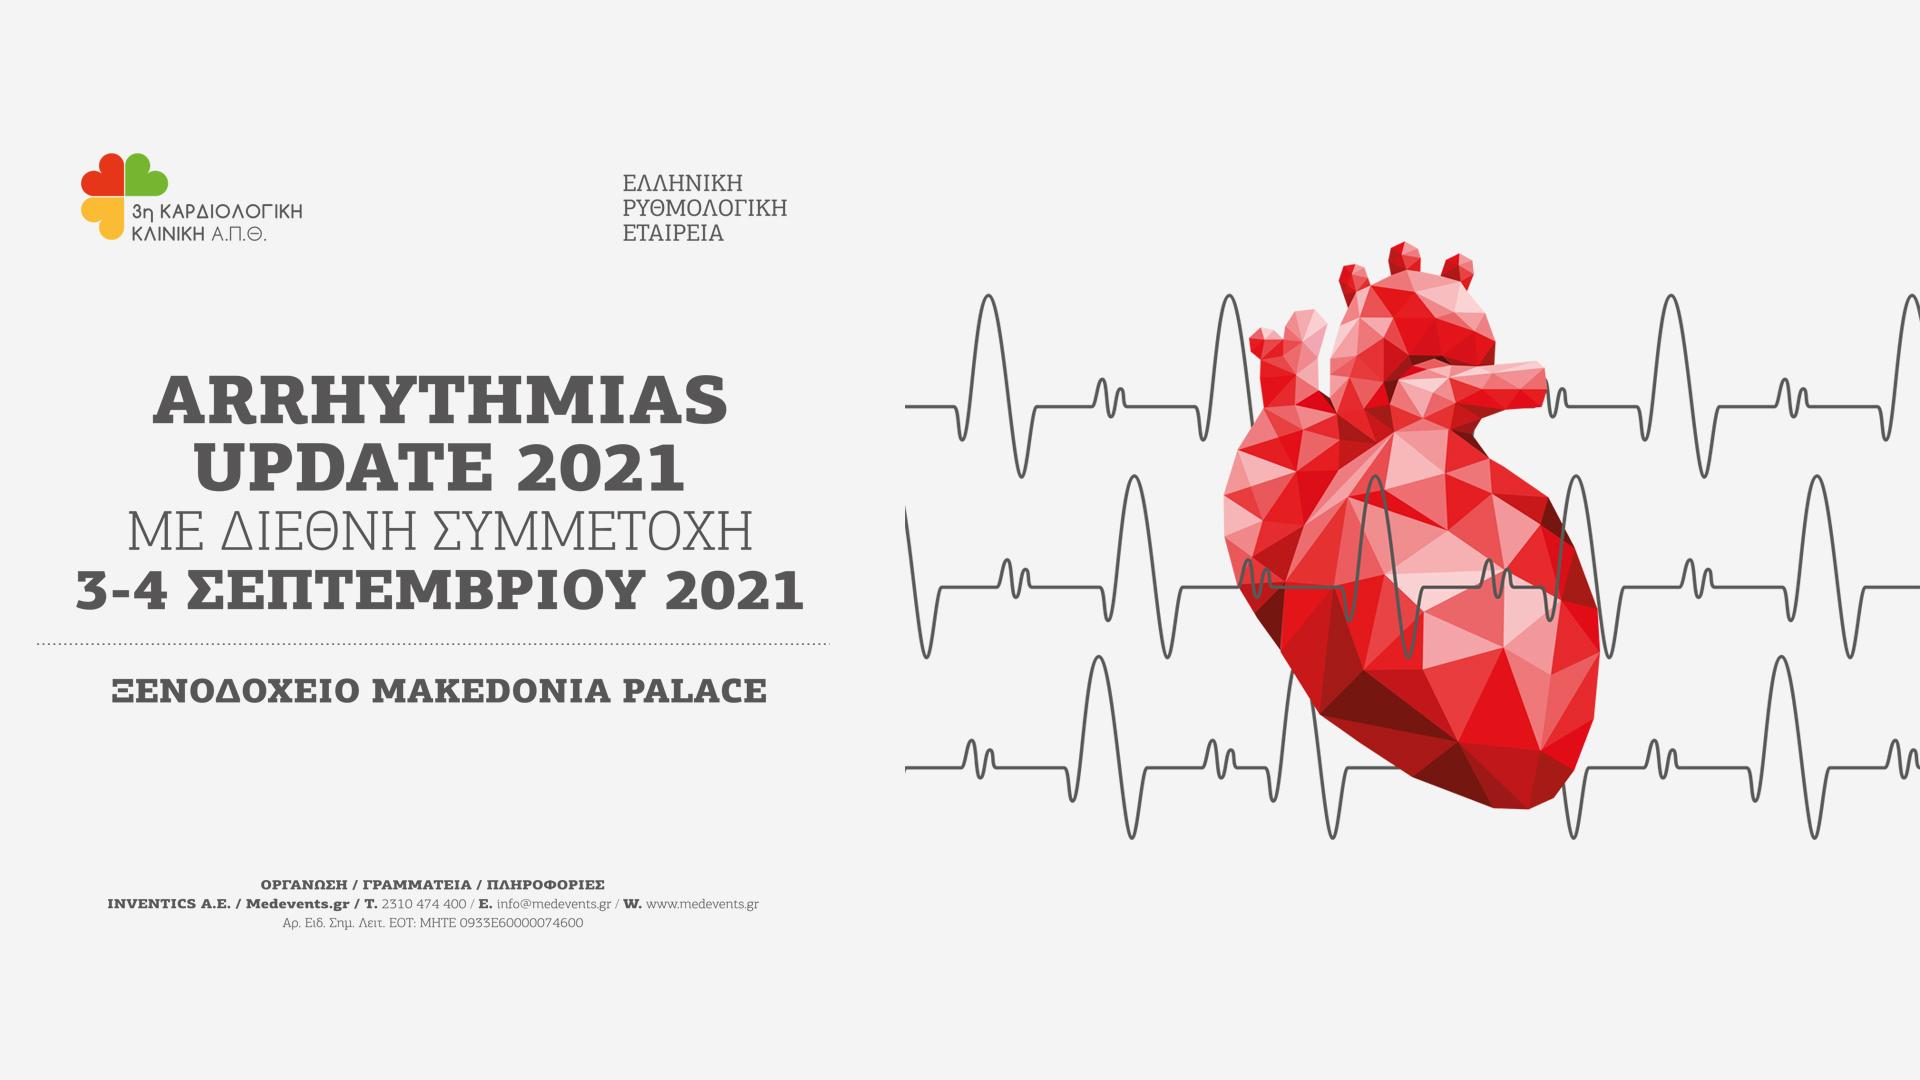 Arrhythmias Update 2021